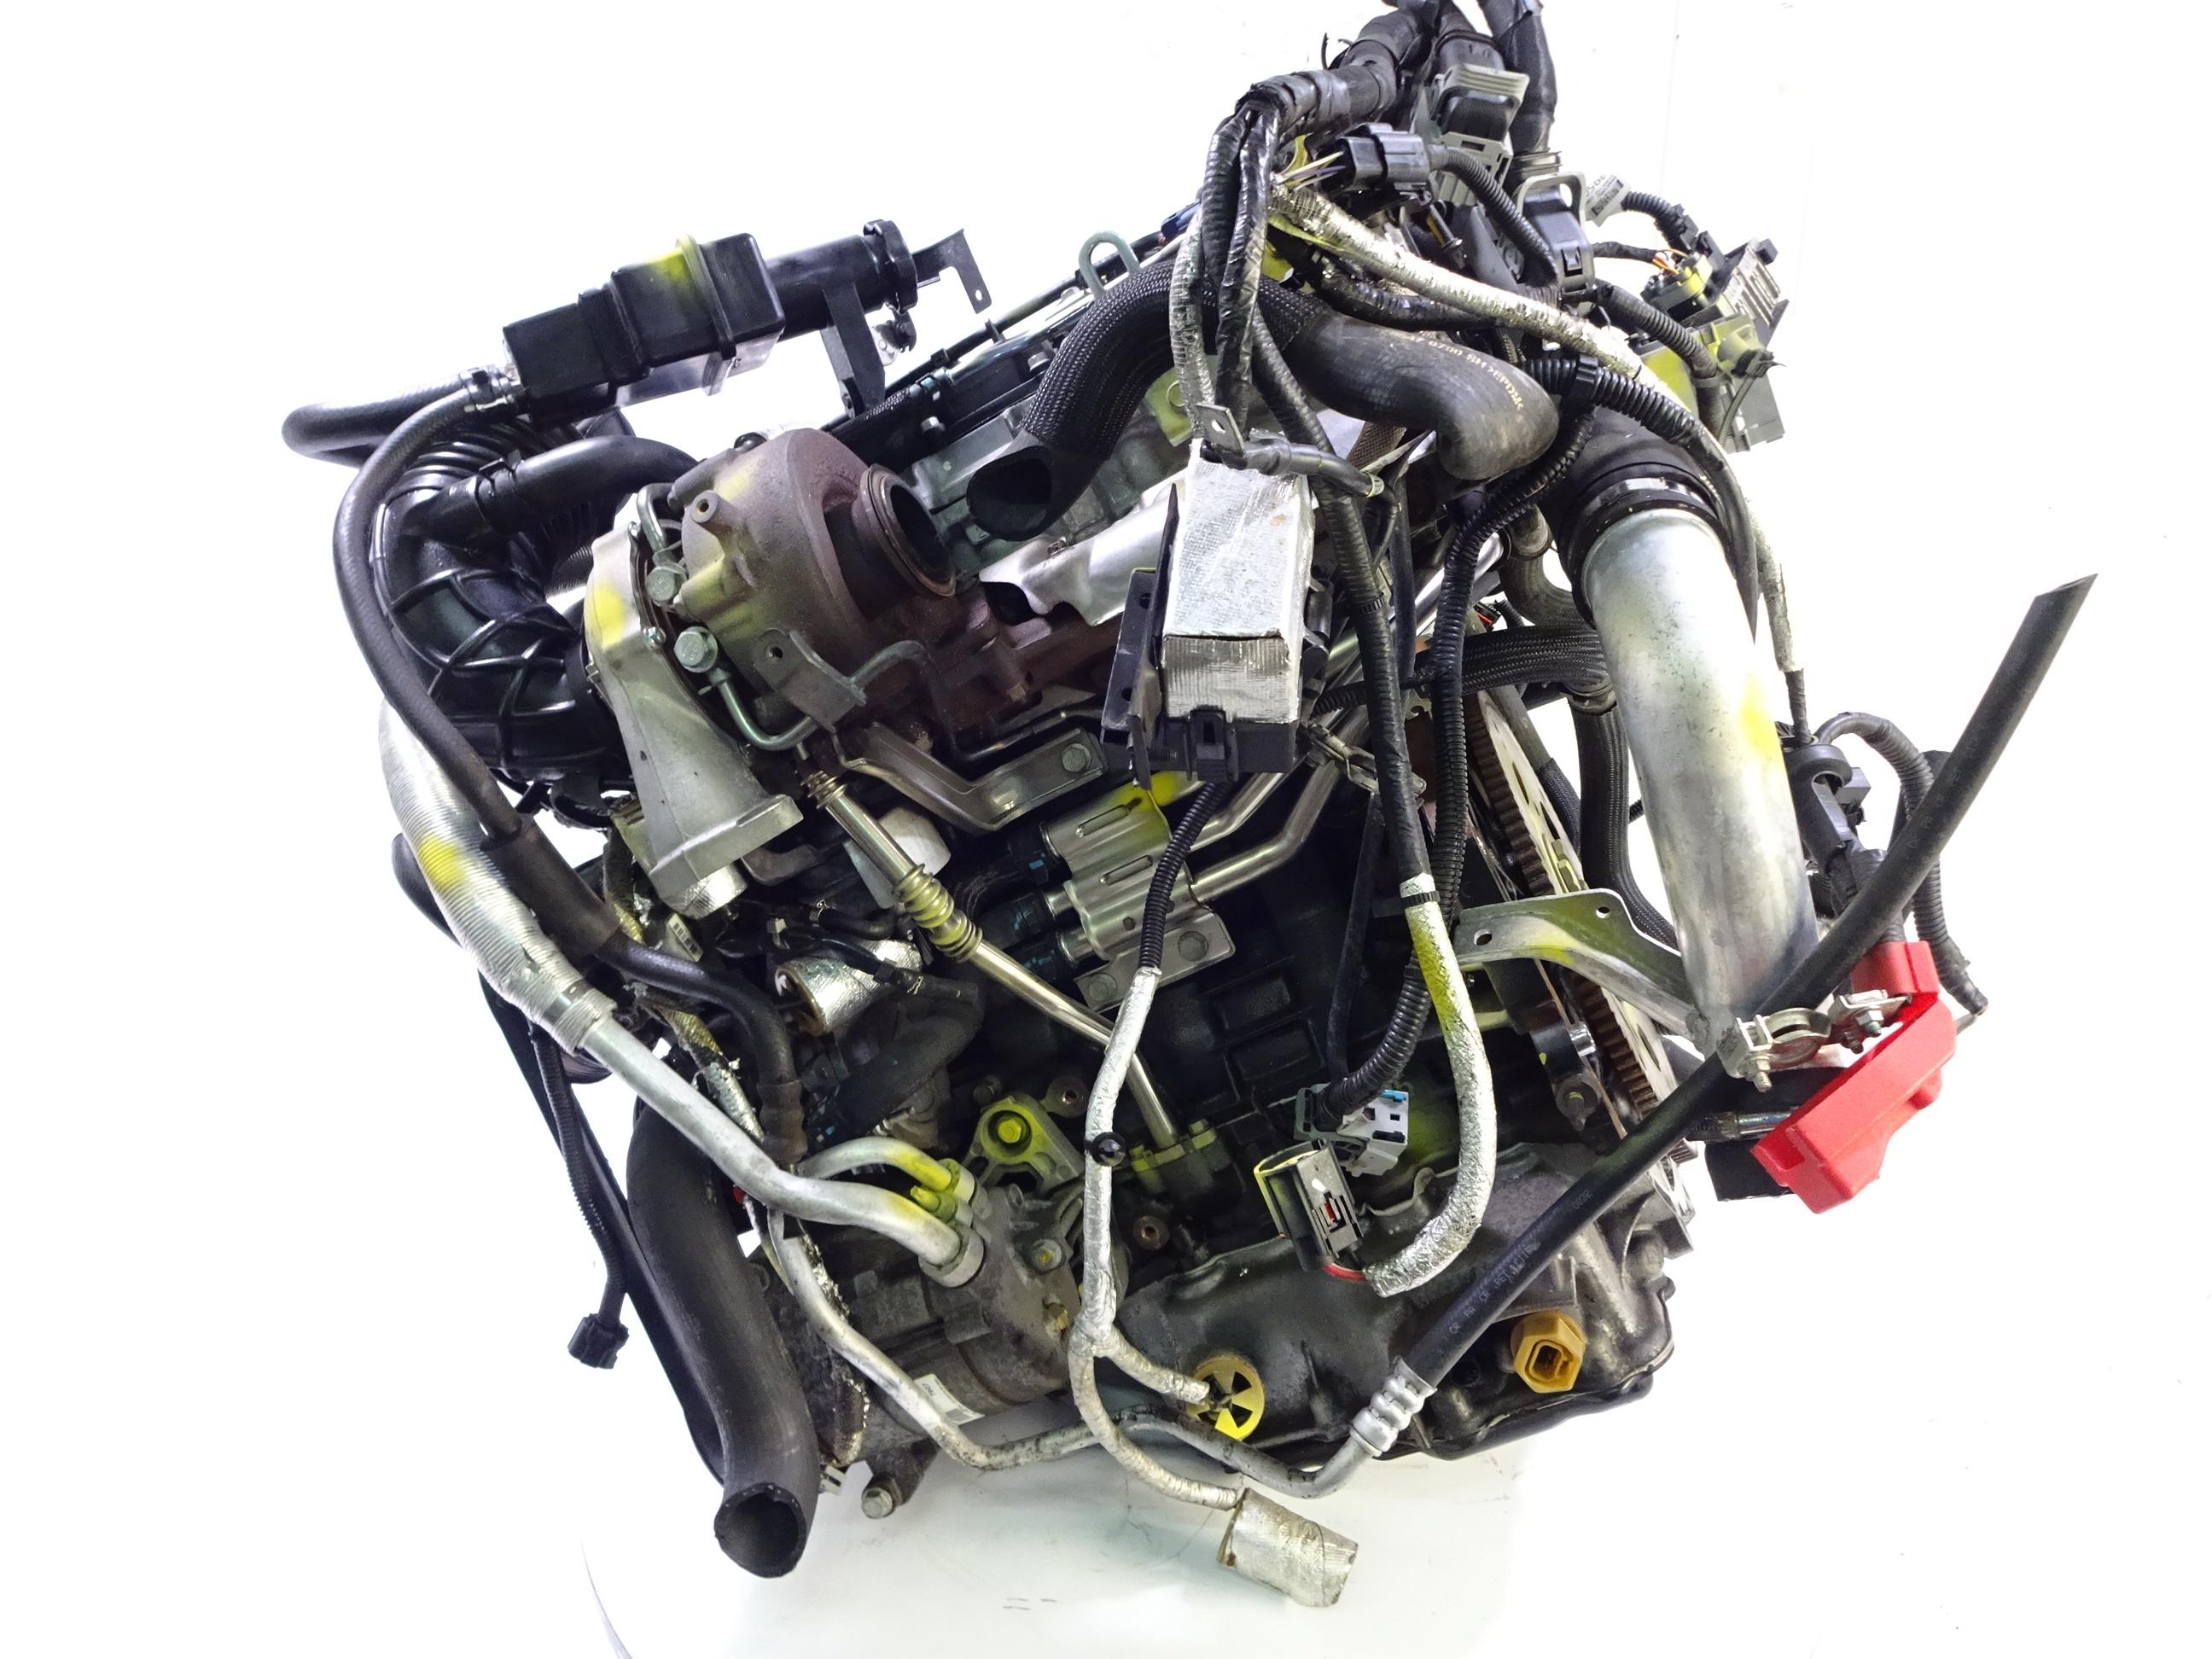 Motor 2014 Chevrolet Opel Captiva Antara 2,2 D Z22D1 A22DMH mit Anbauteilen